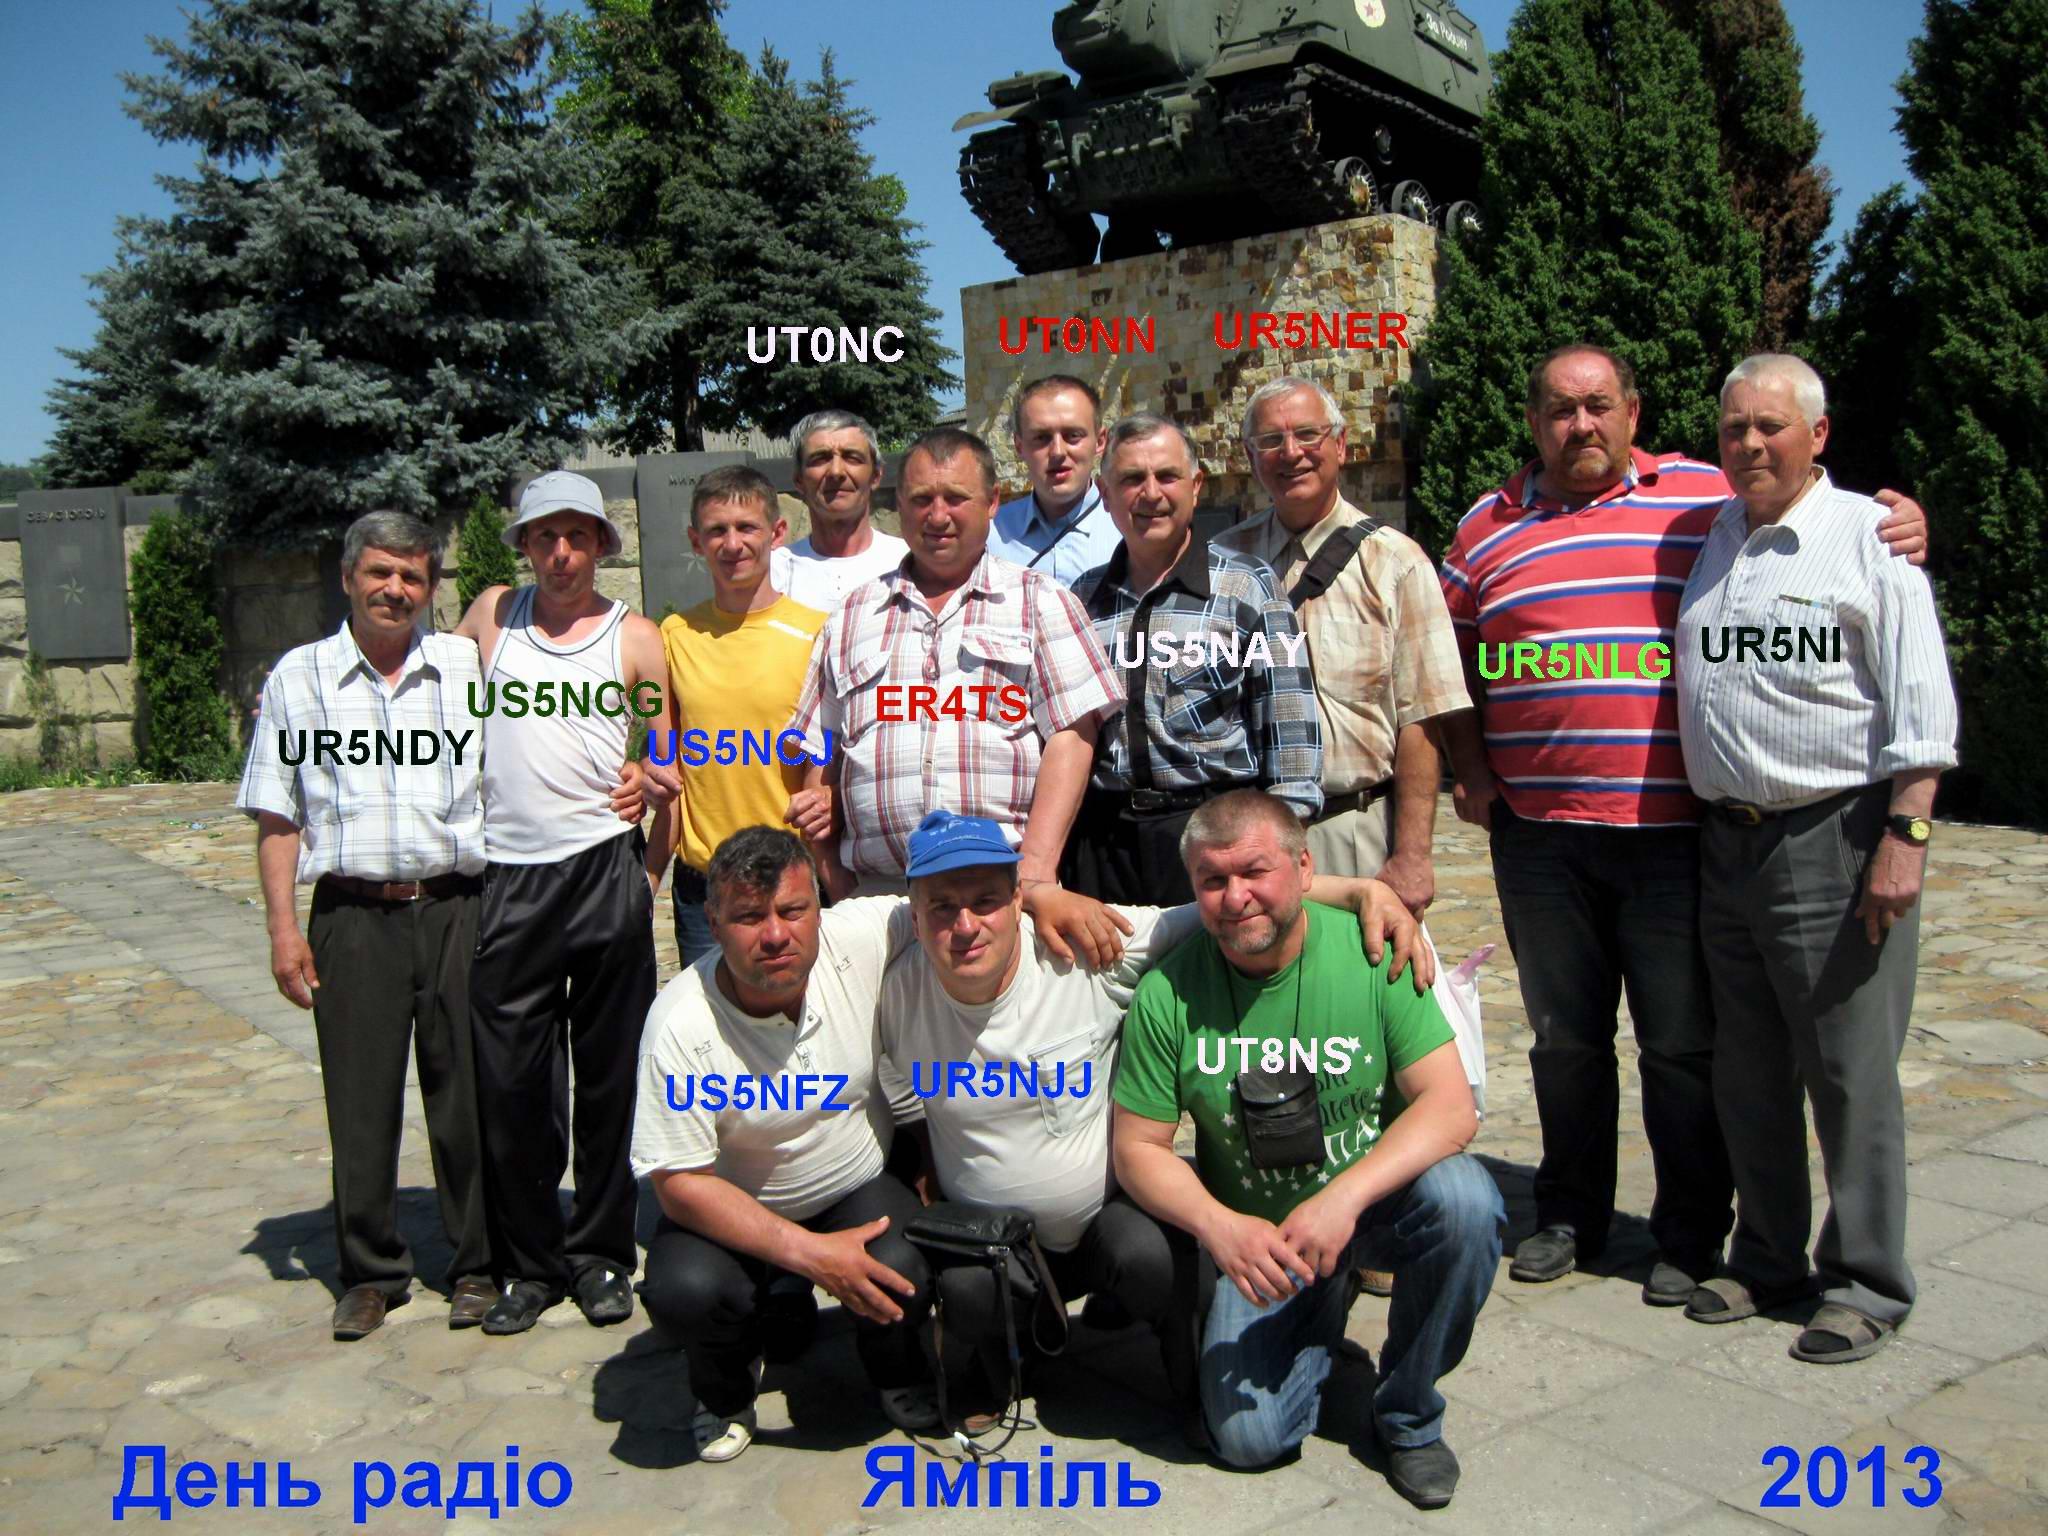 http://ur4nww.narod.ru/cqnews/img/yamp2013_1.jpg